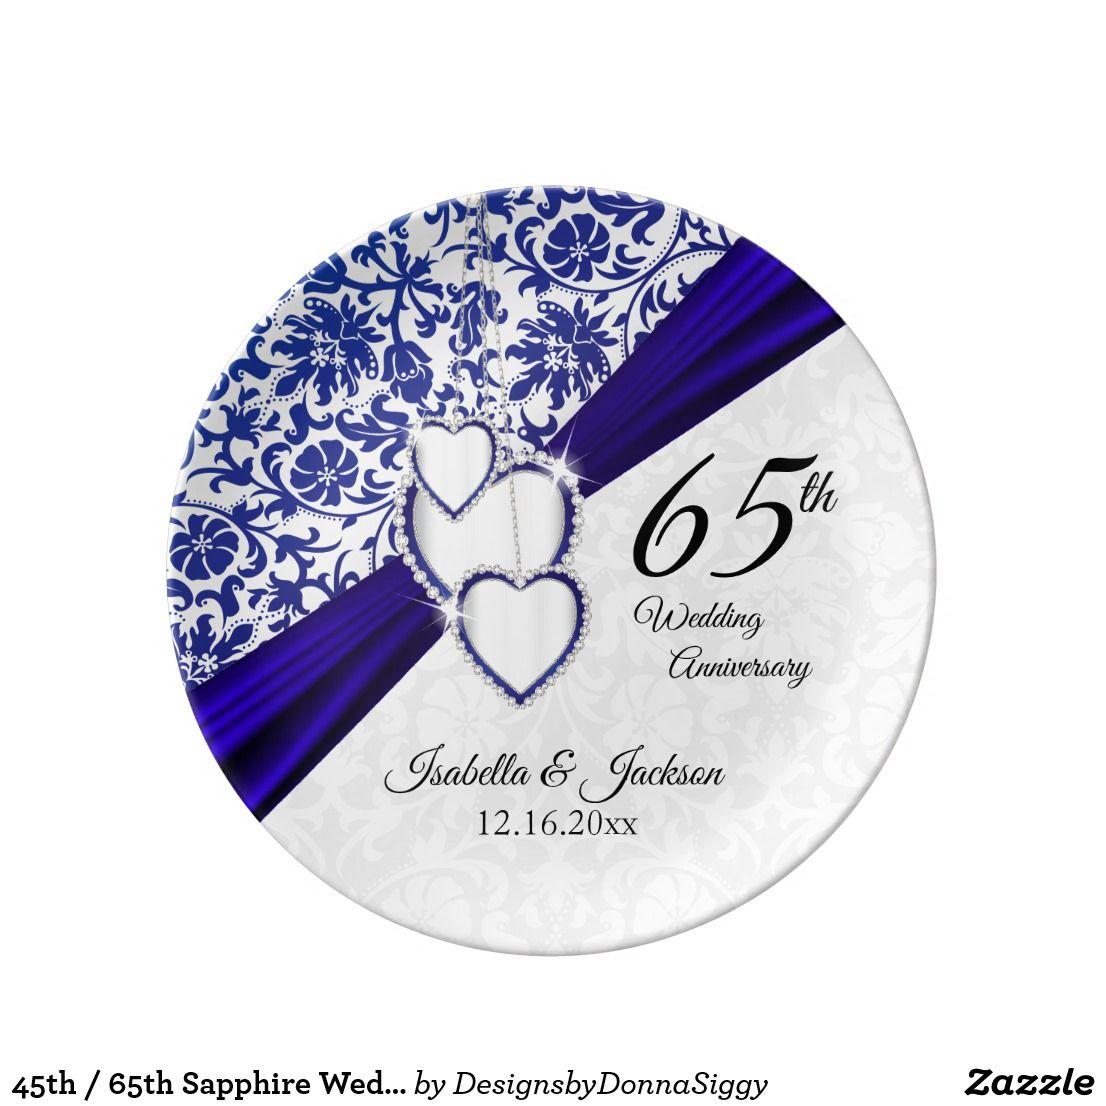 45th / 65th Sapphire Wedding Anniversary Dinner Plate